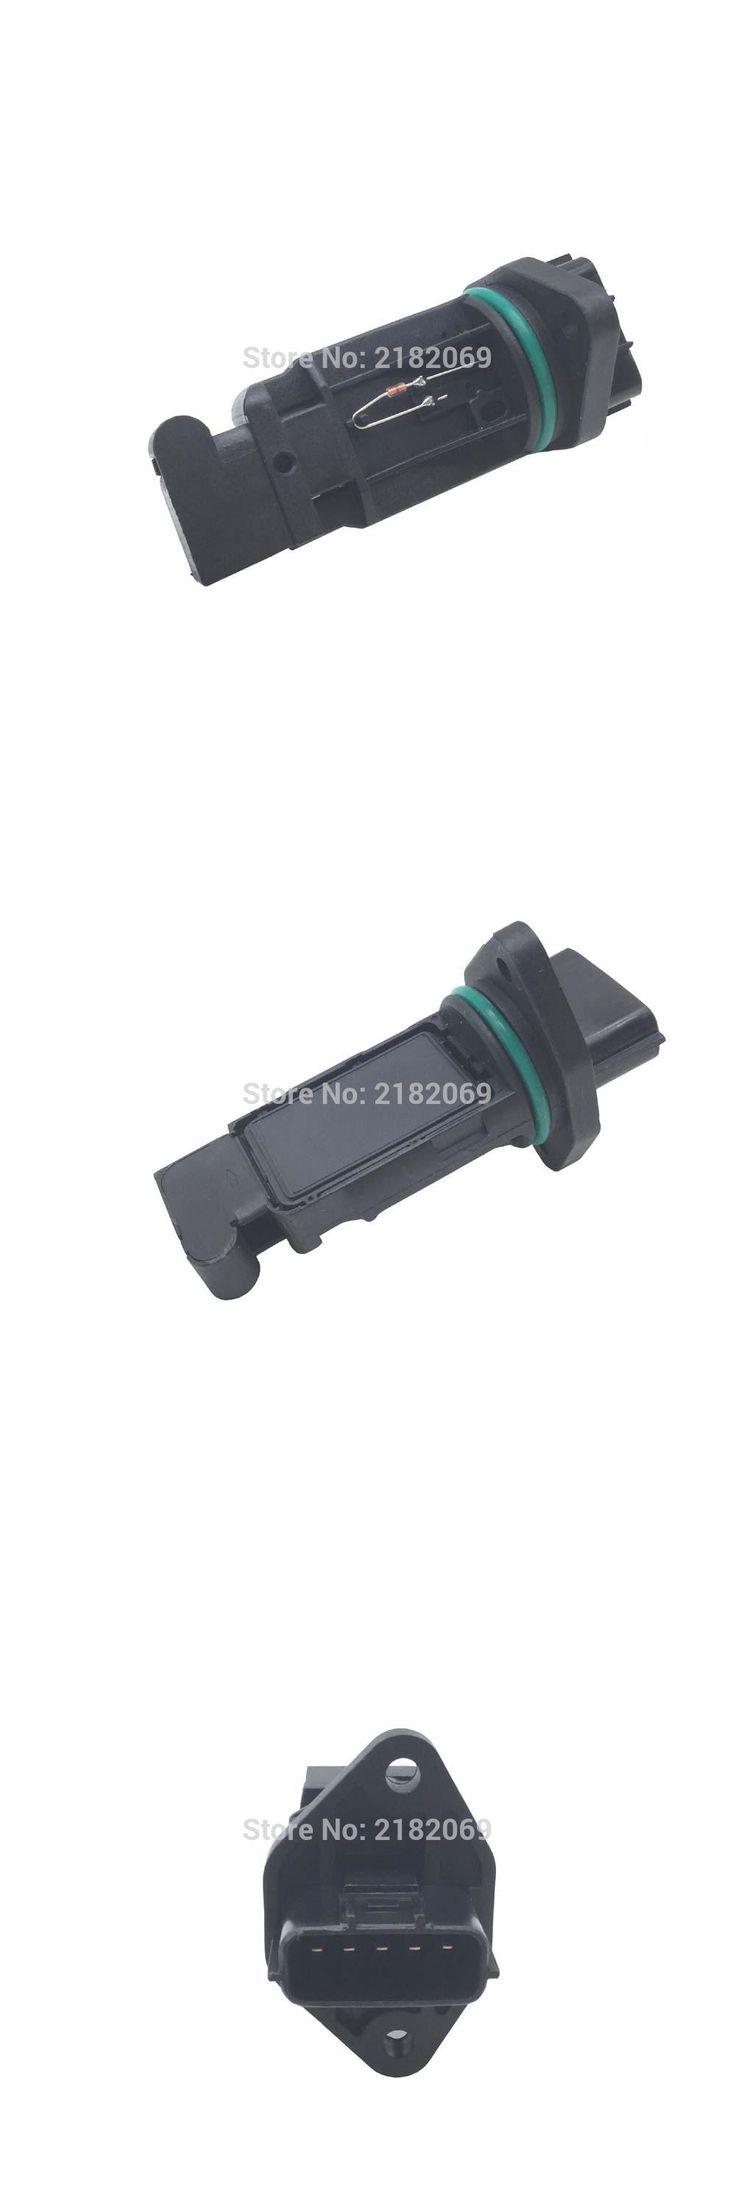 [Visit to Buy] Mass Air Flow Maf Sensor Meter For Nissan Primera P11 P12 WP11 WP12 Almera Tino 2.0 22680-6N21A 22680-6N210 22680-7J500 #Advertisement